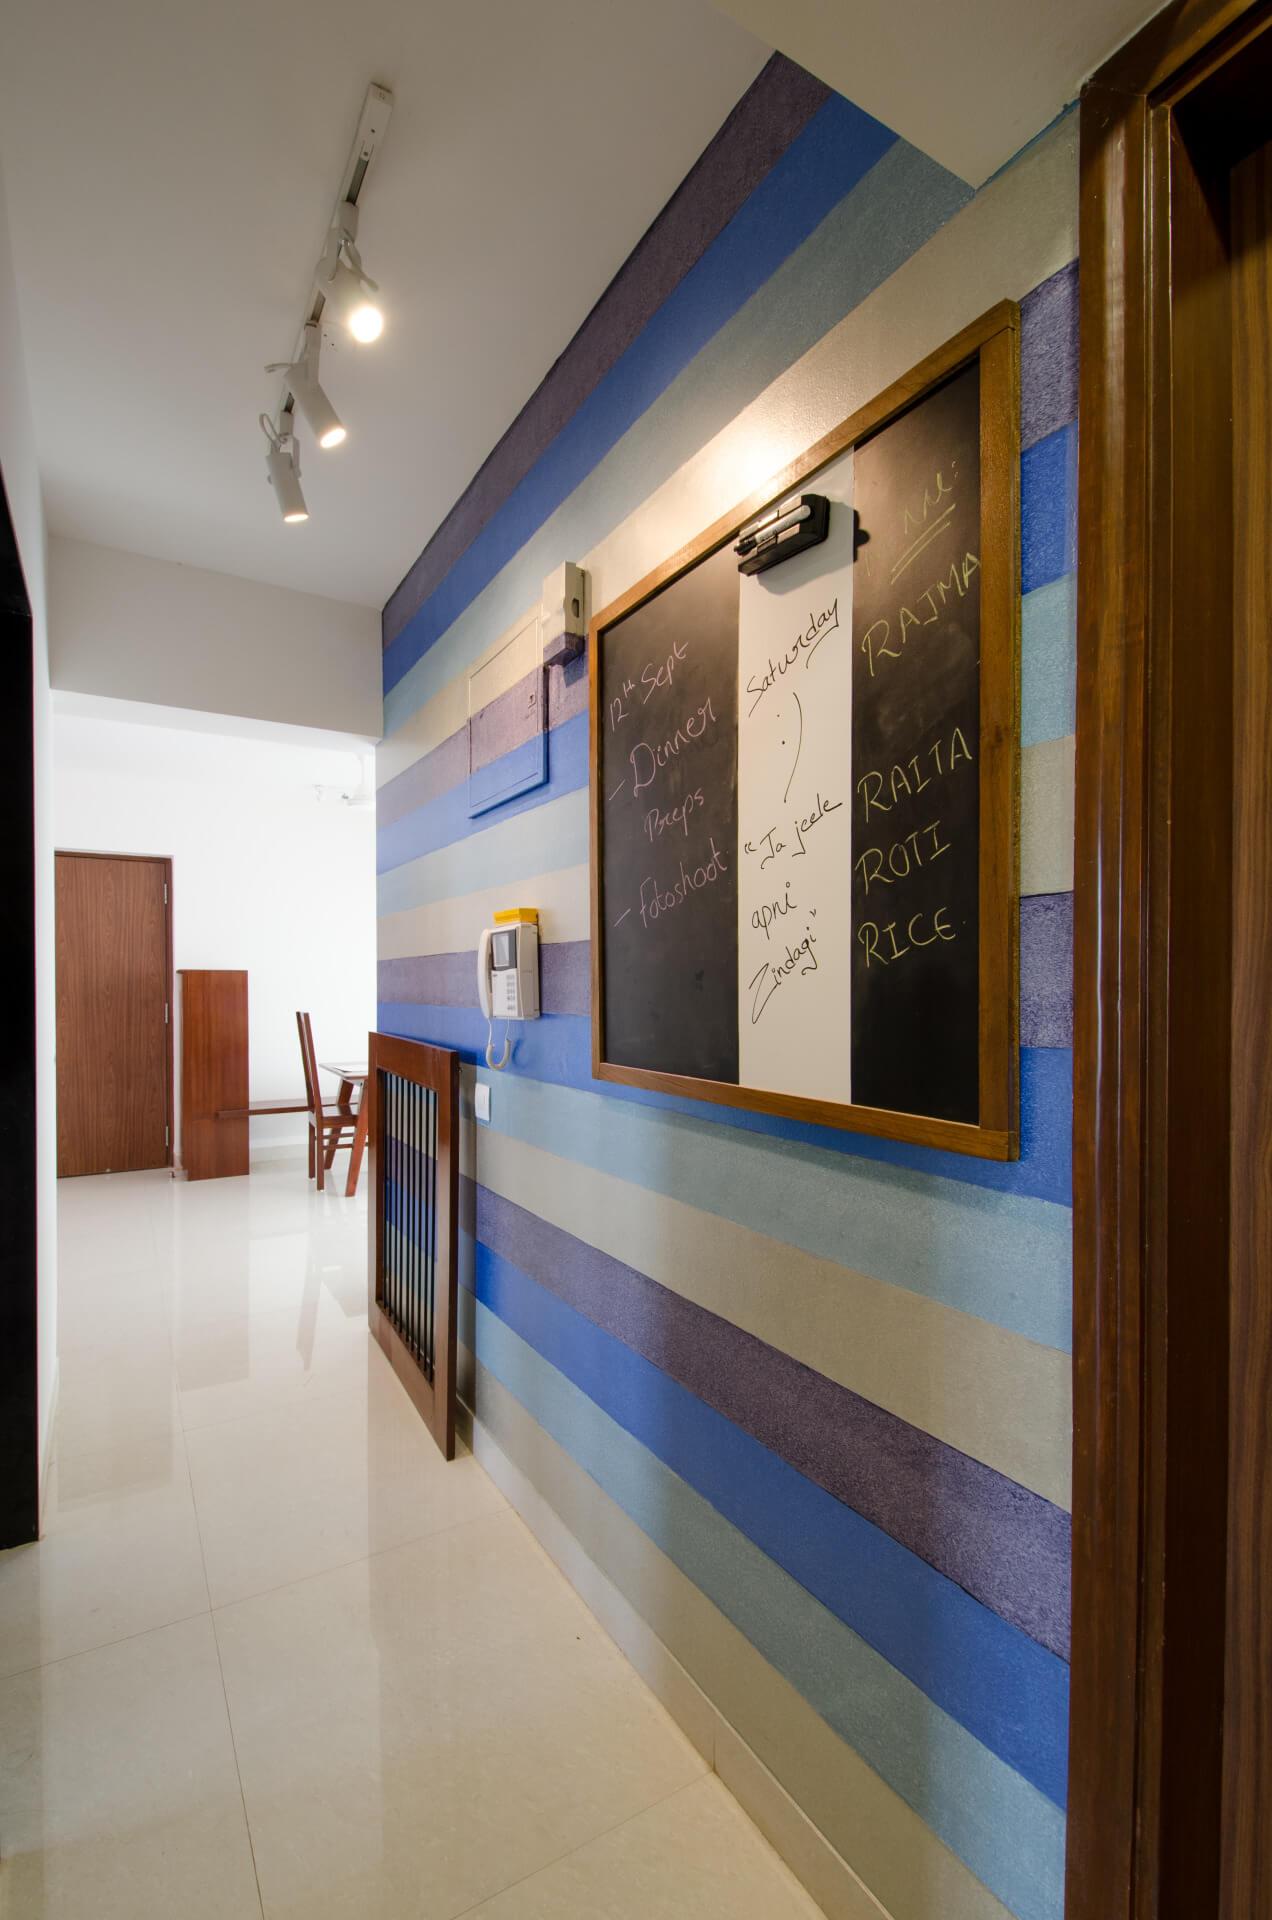 ghungroo house 7 gallery